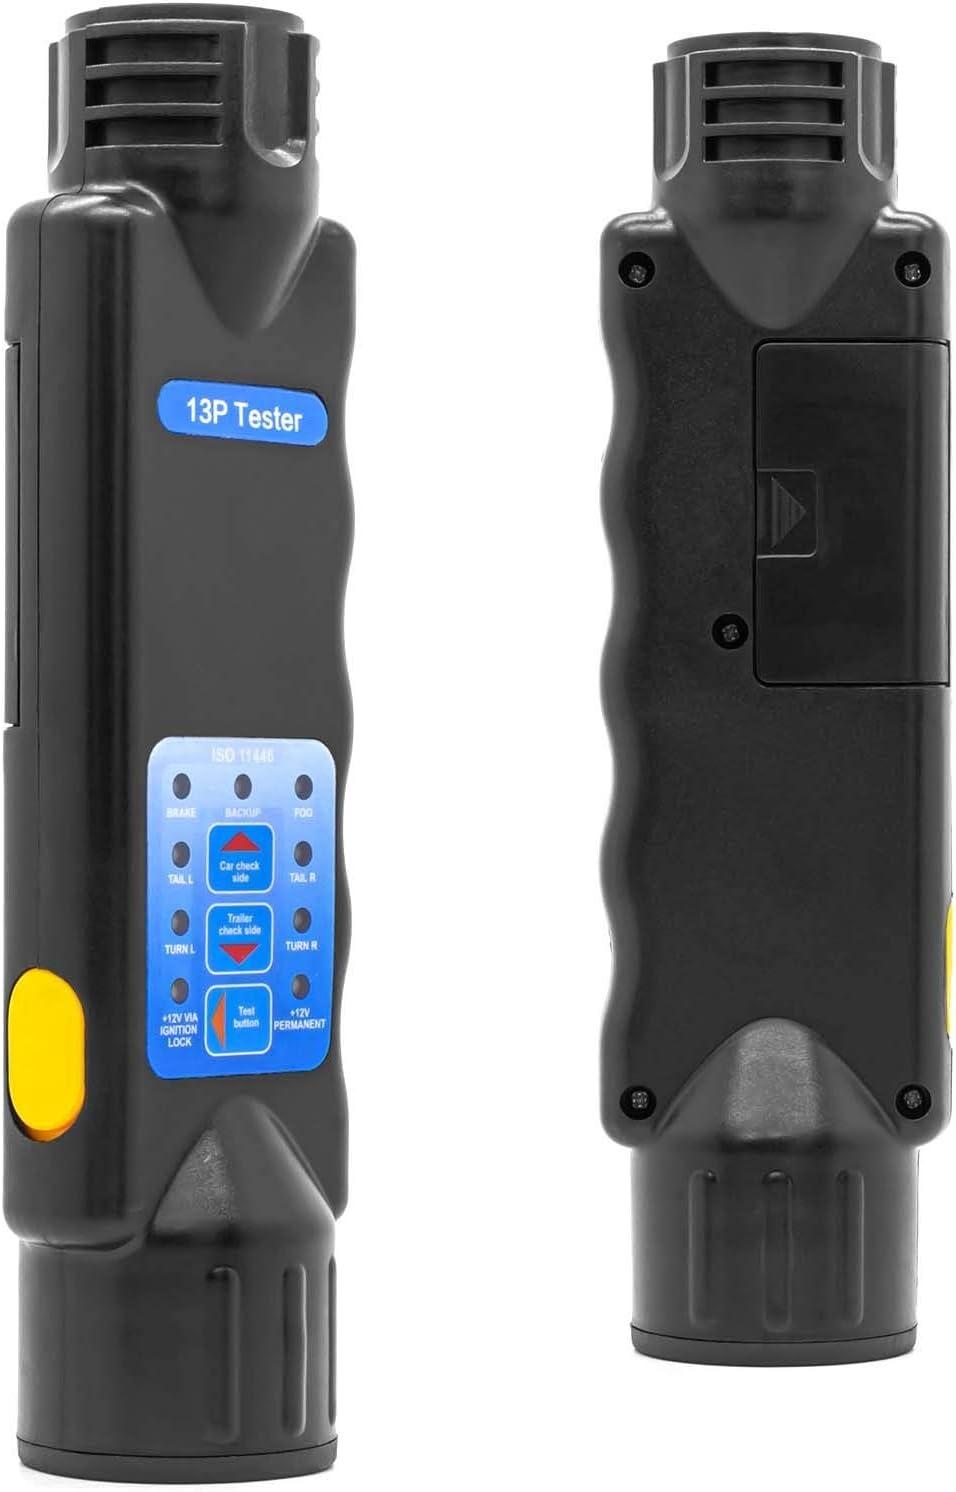 KFZ DIN Pr/üfger/ät Anh/änger Licht Beleuchtung Tester 13 Polig Trailer Pr/üfer